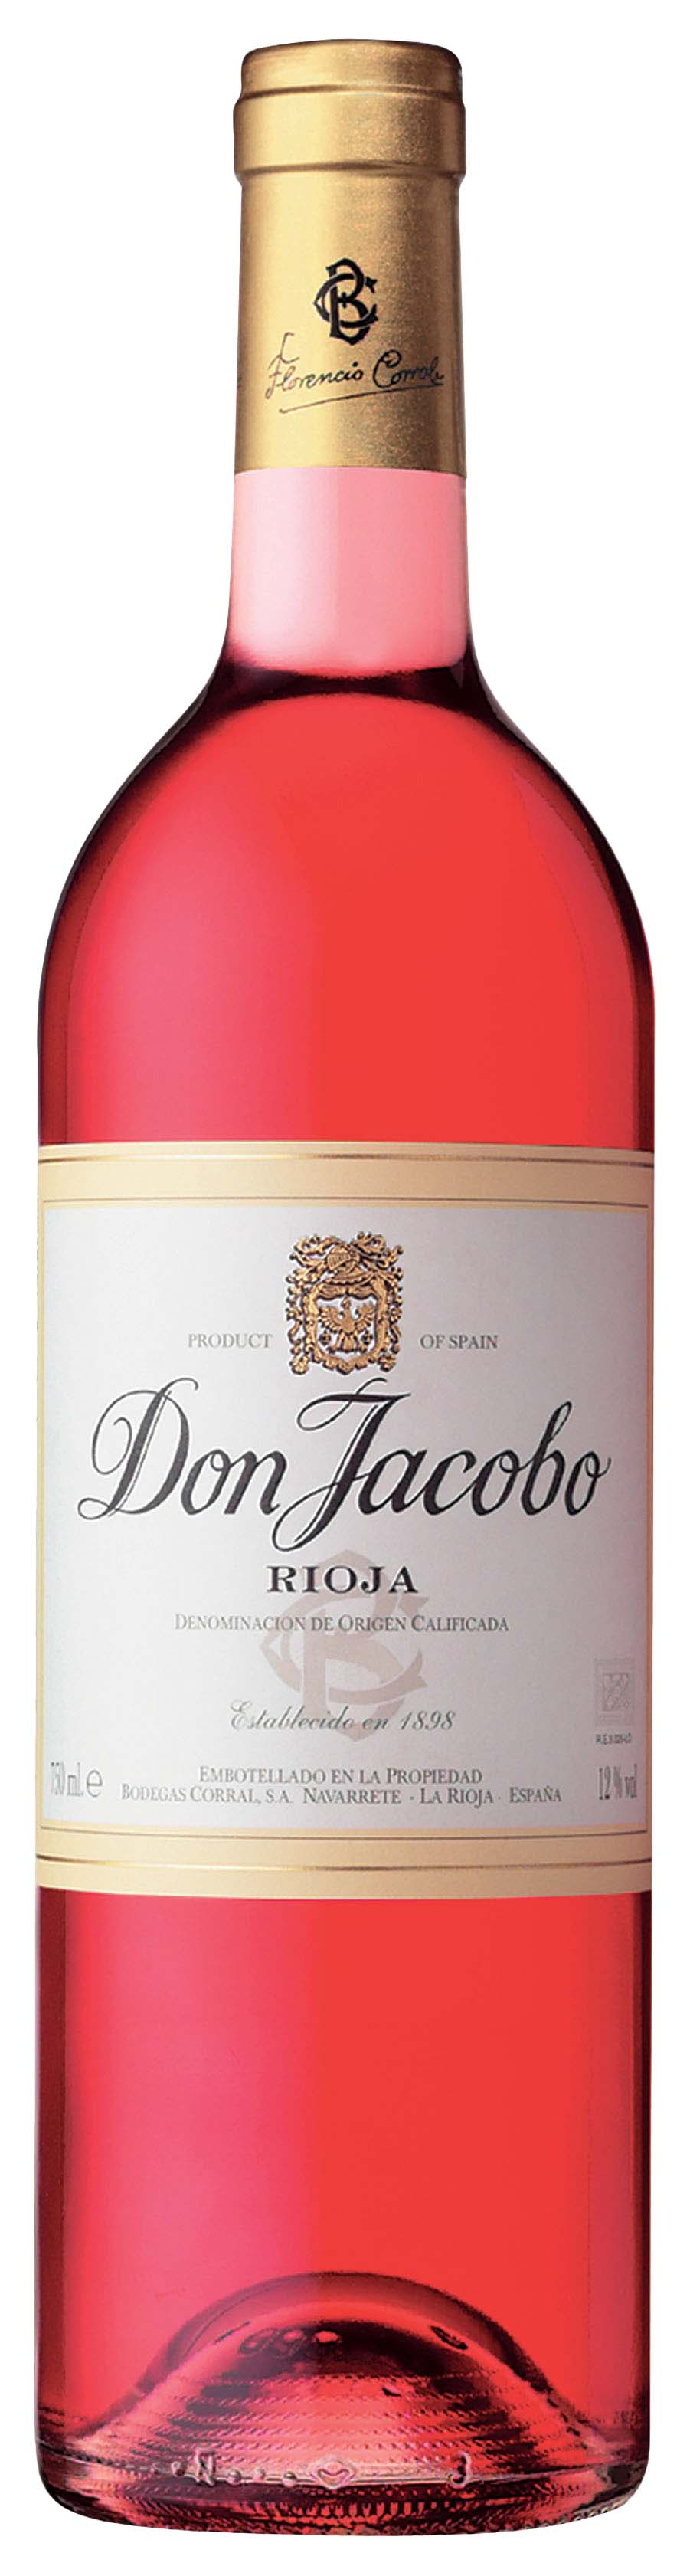 vino Don Jacobo